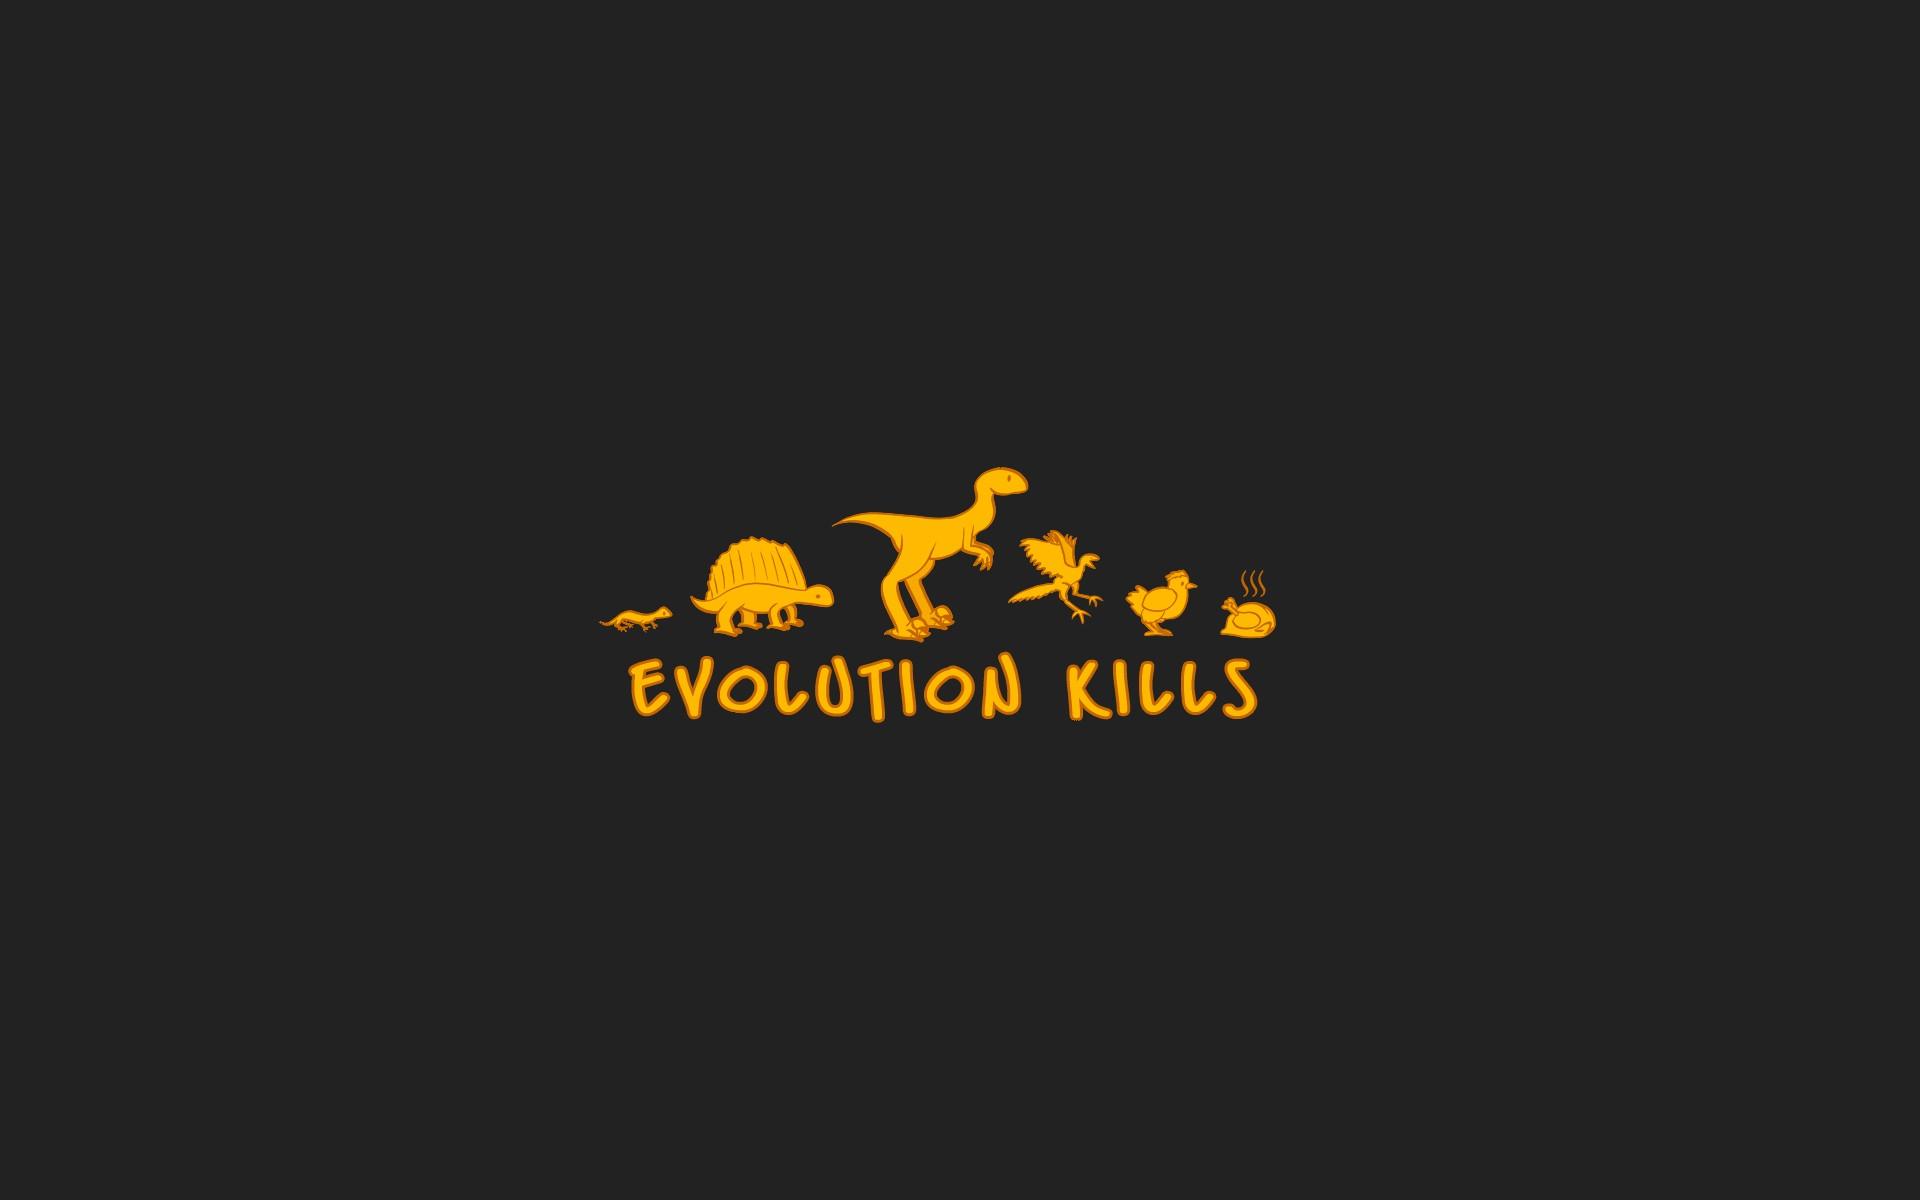 evolution kills, hd inspiration, 4k wallpapers, images, backgrounds